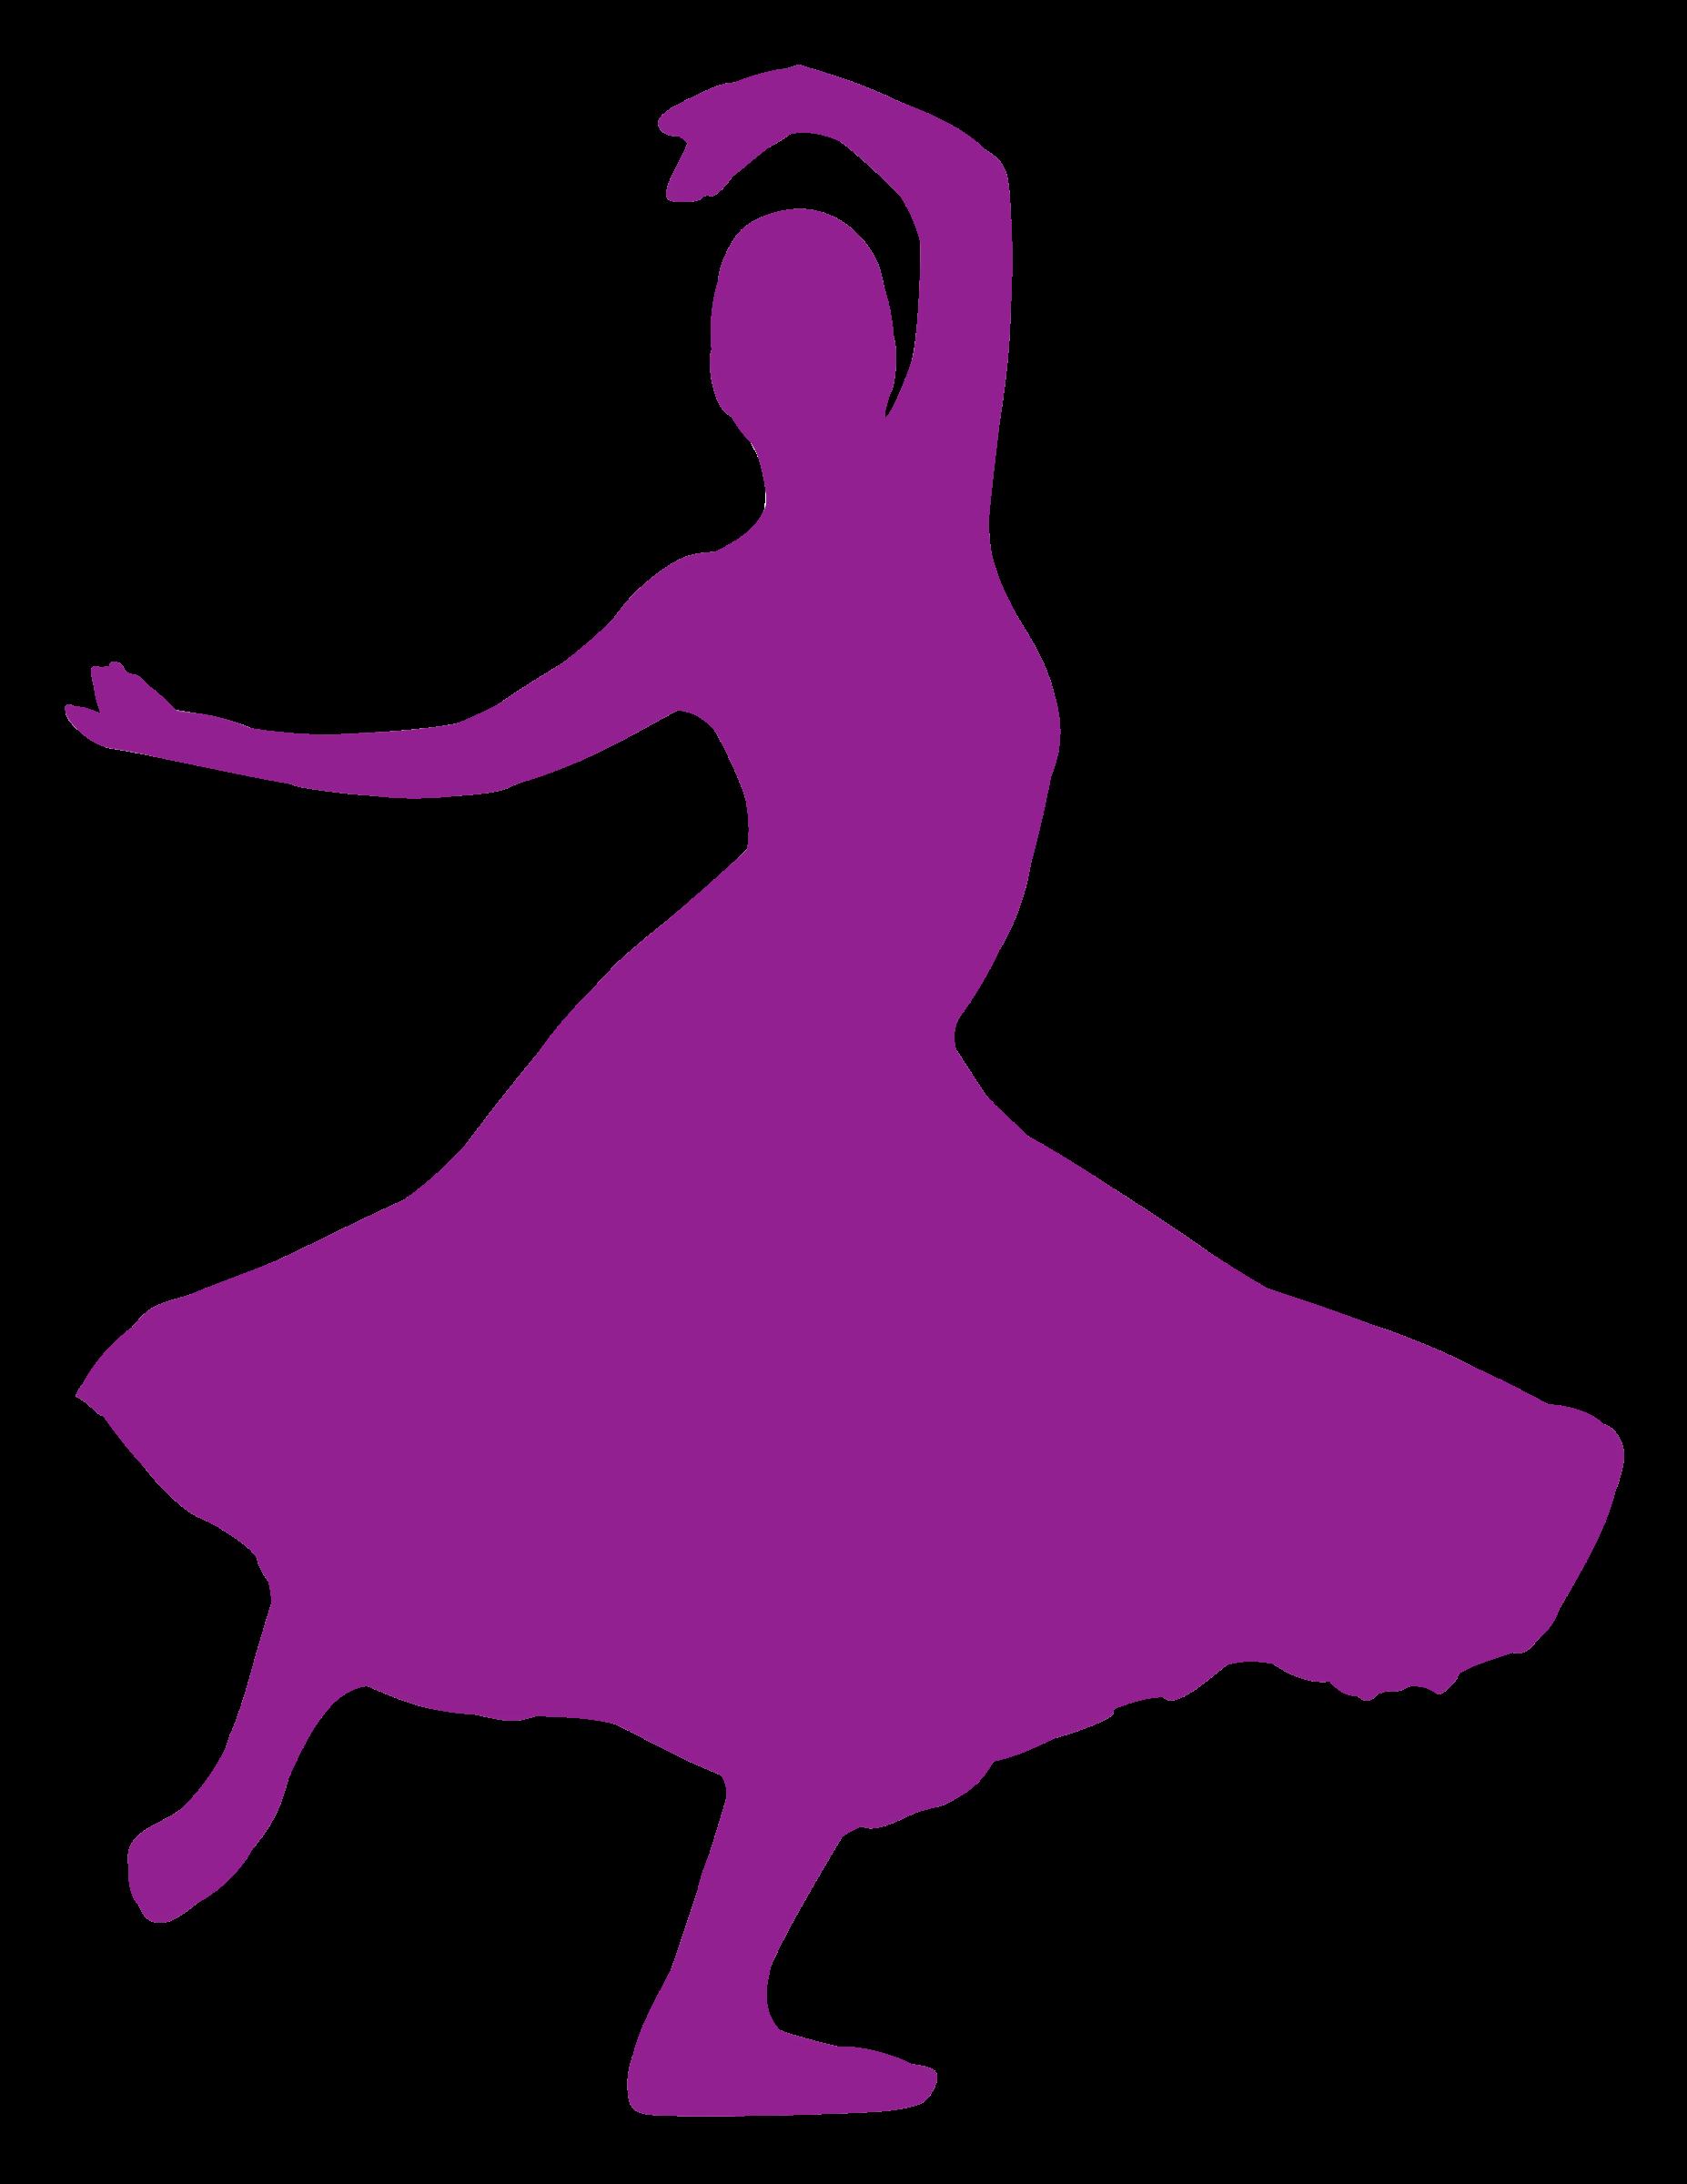 Danse clipart silhouette Silhouette Silhouette Danse Clipart 13